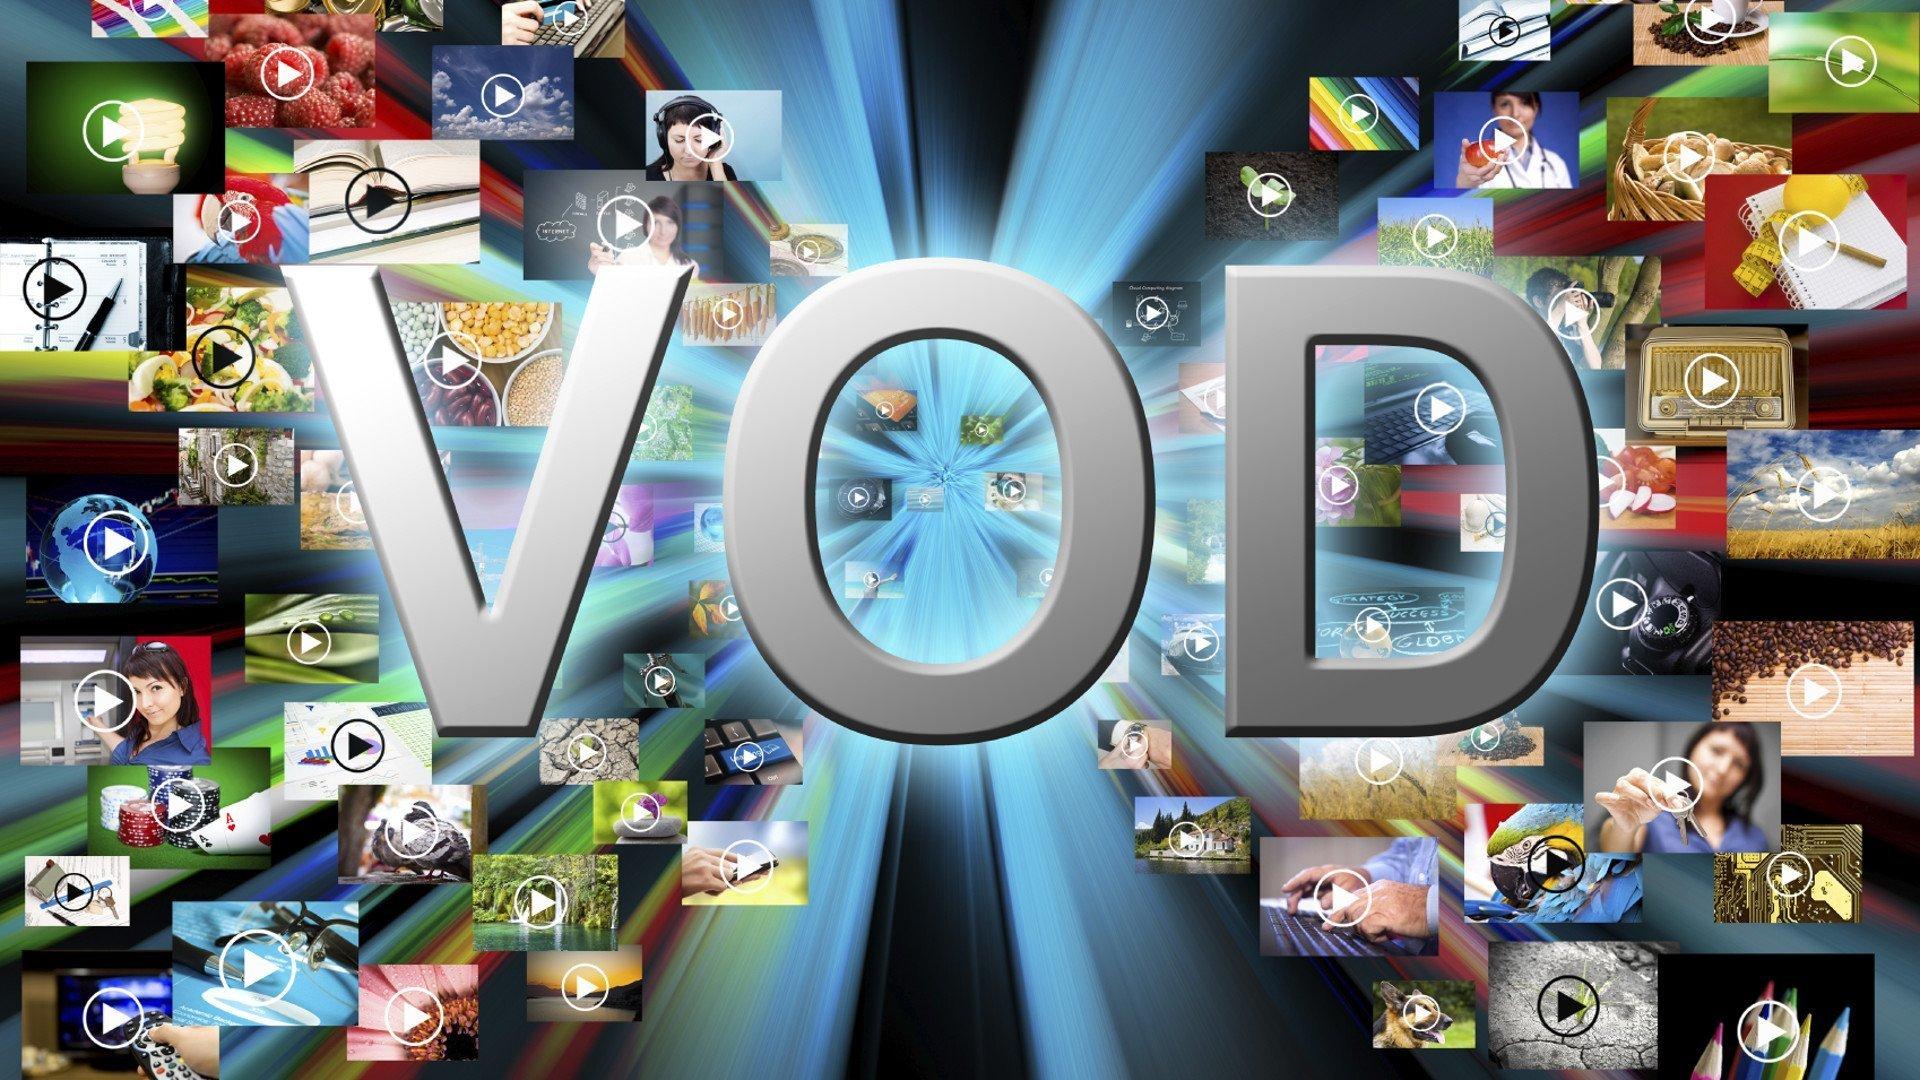 SPOT Technologie verandert TV-sector radicaal